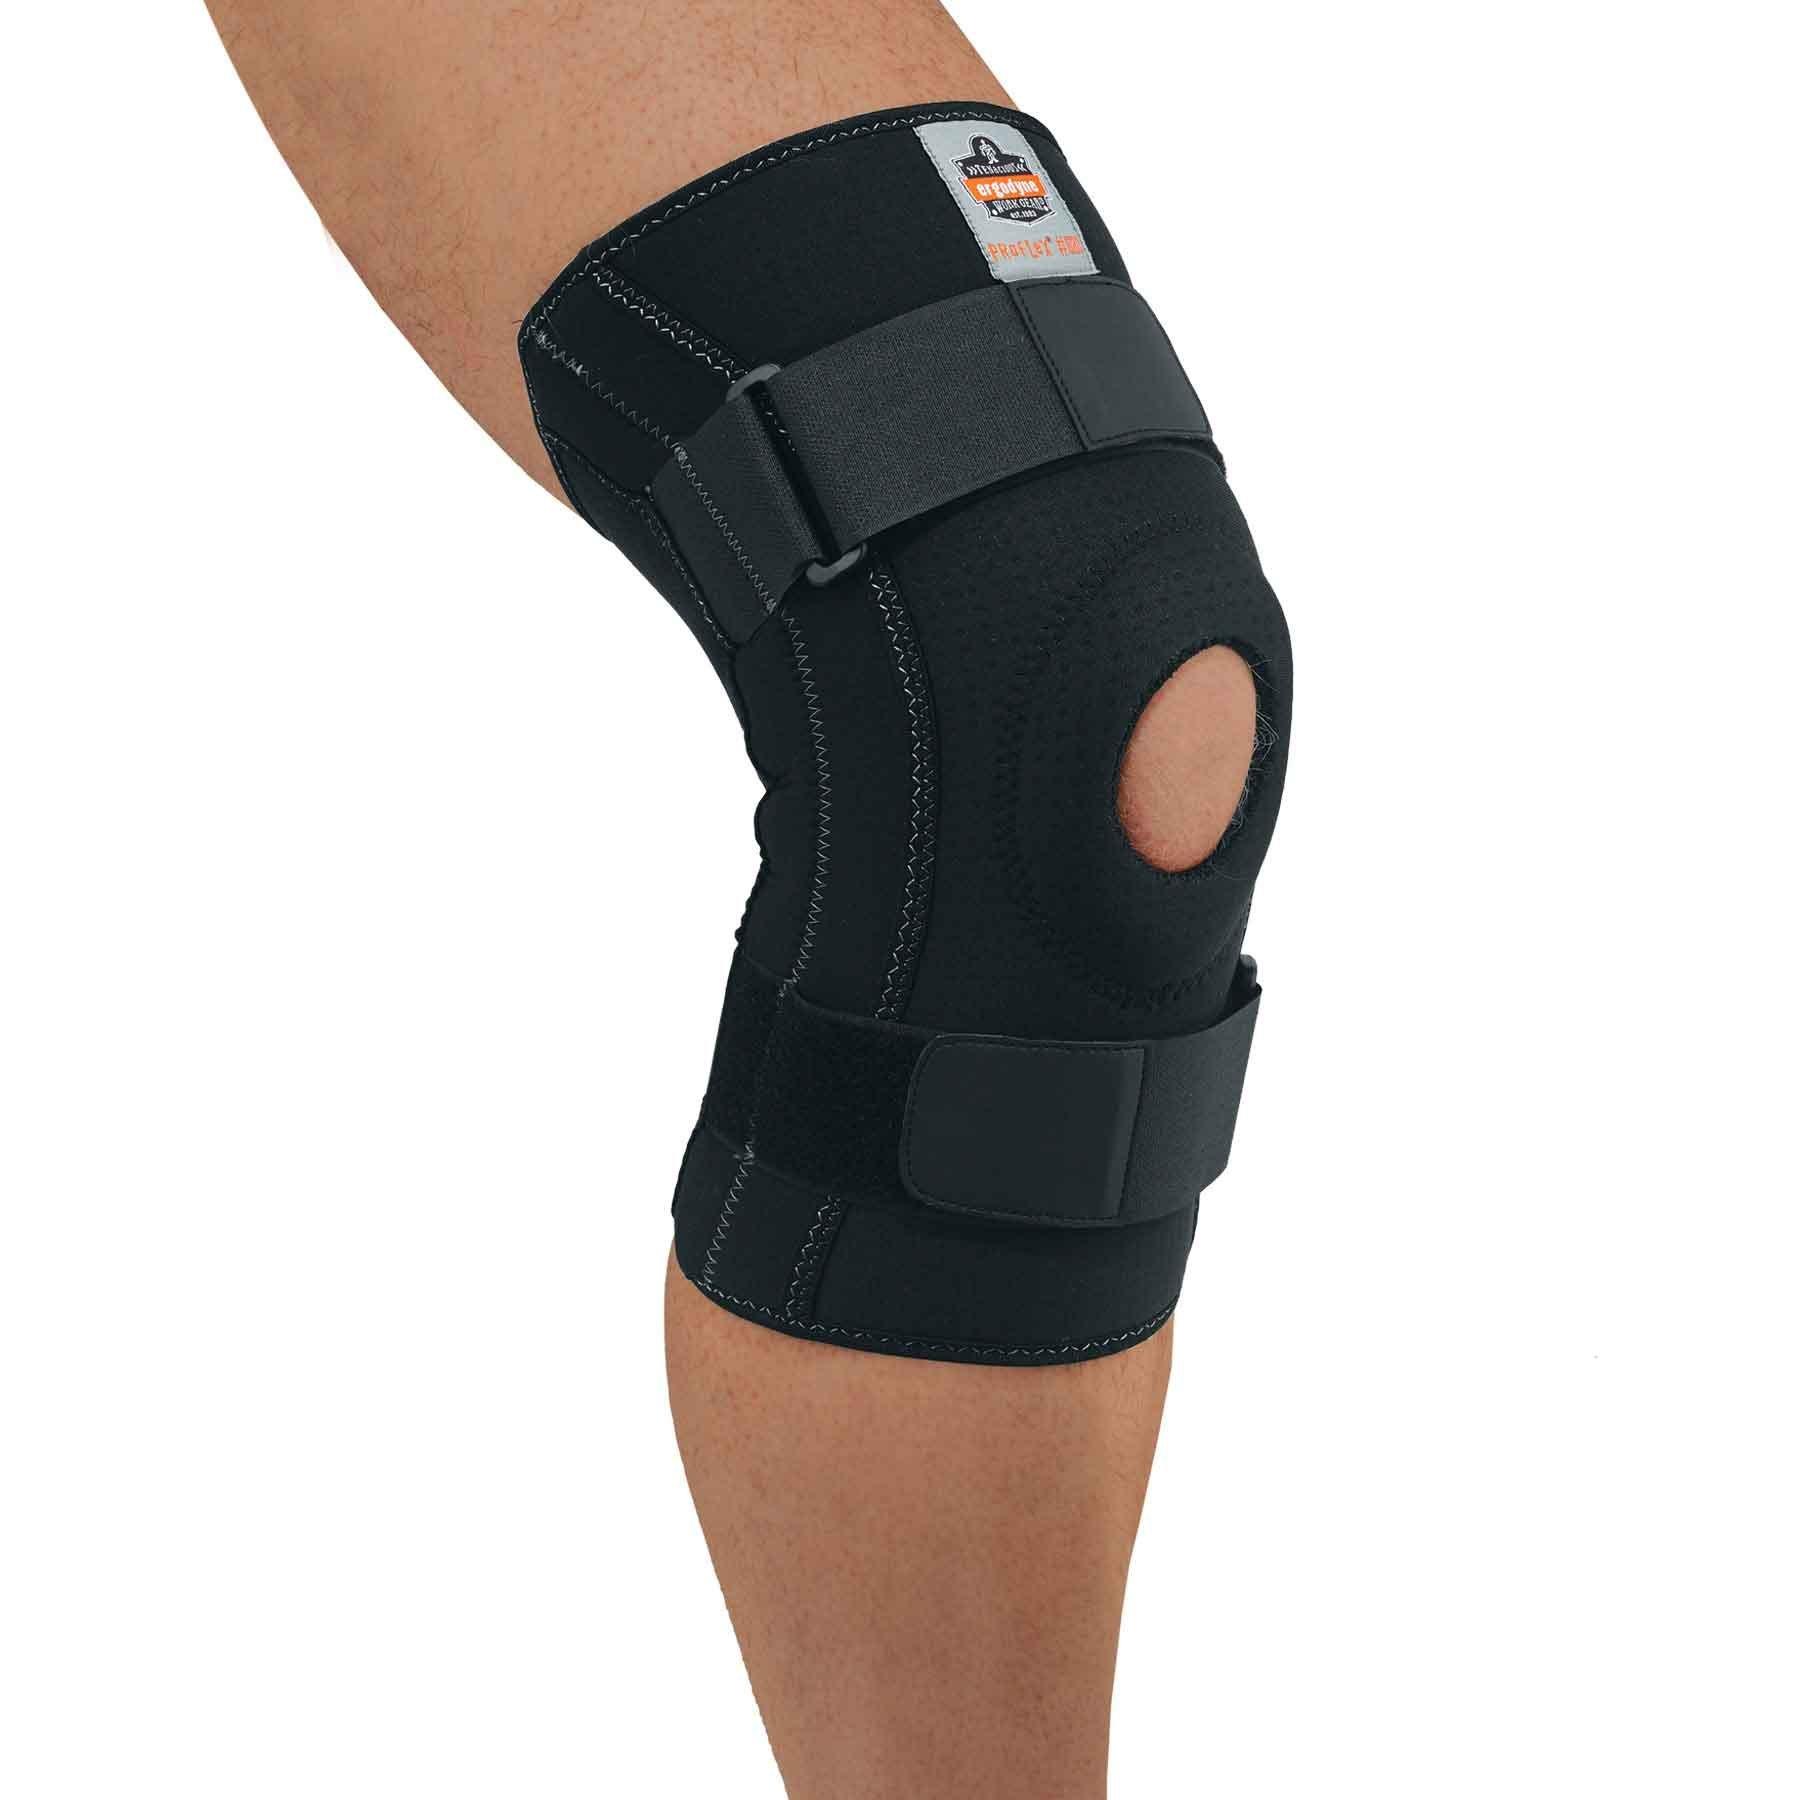 Ergodyne - 620 2XL Black Knee Sleeve w/Open Patella/Spiral Stays